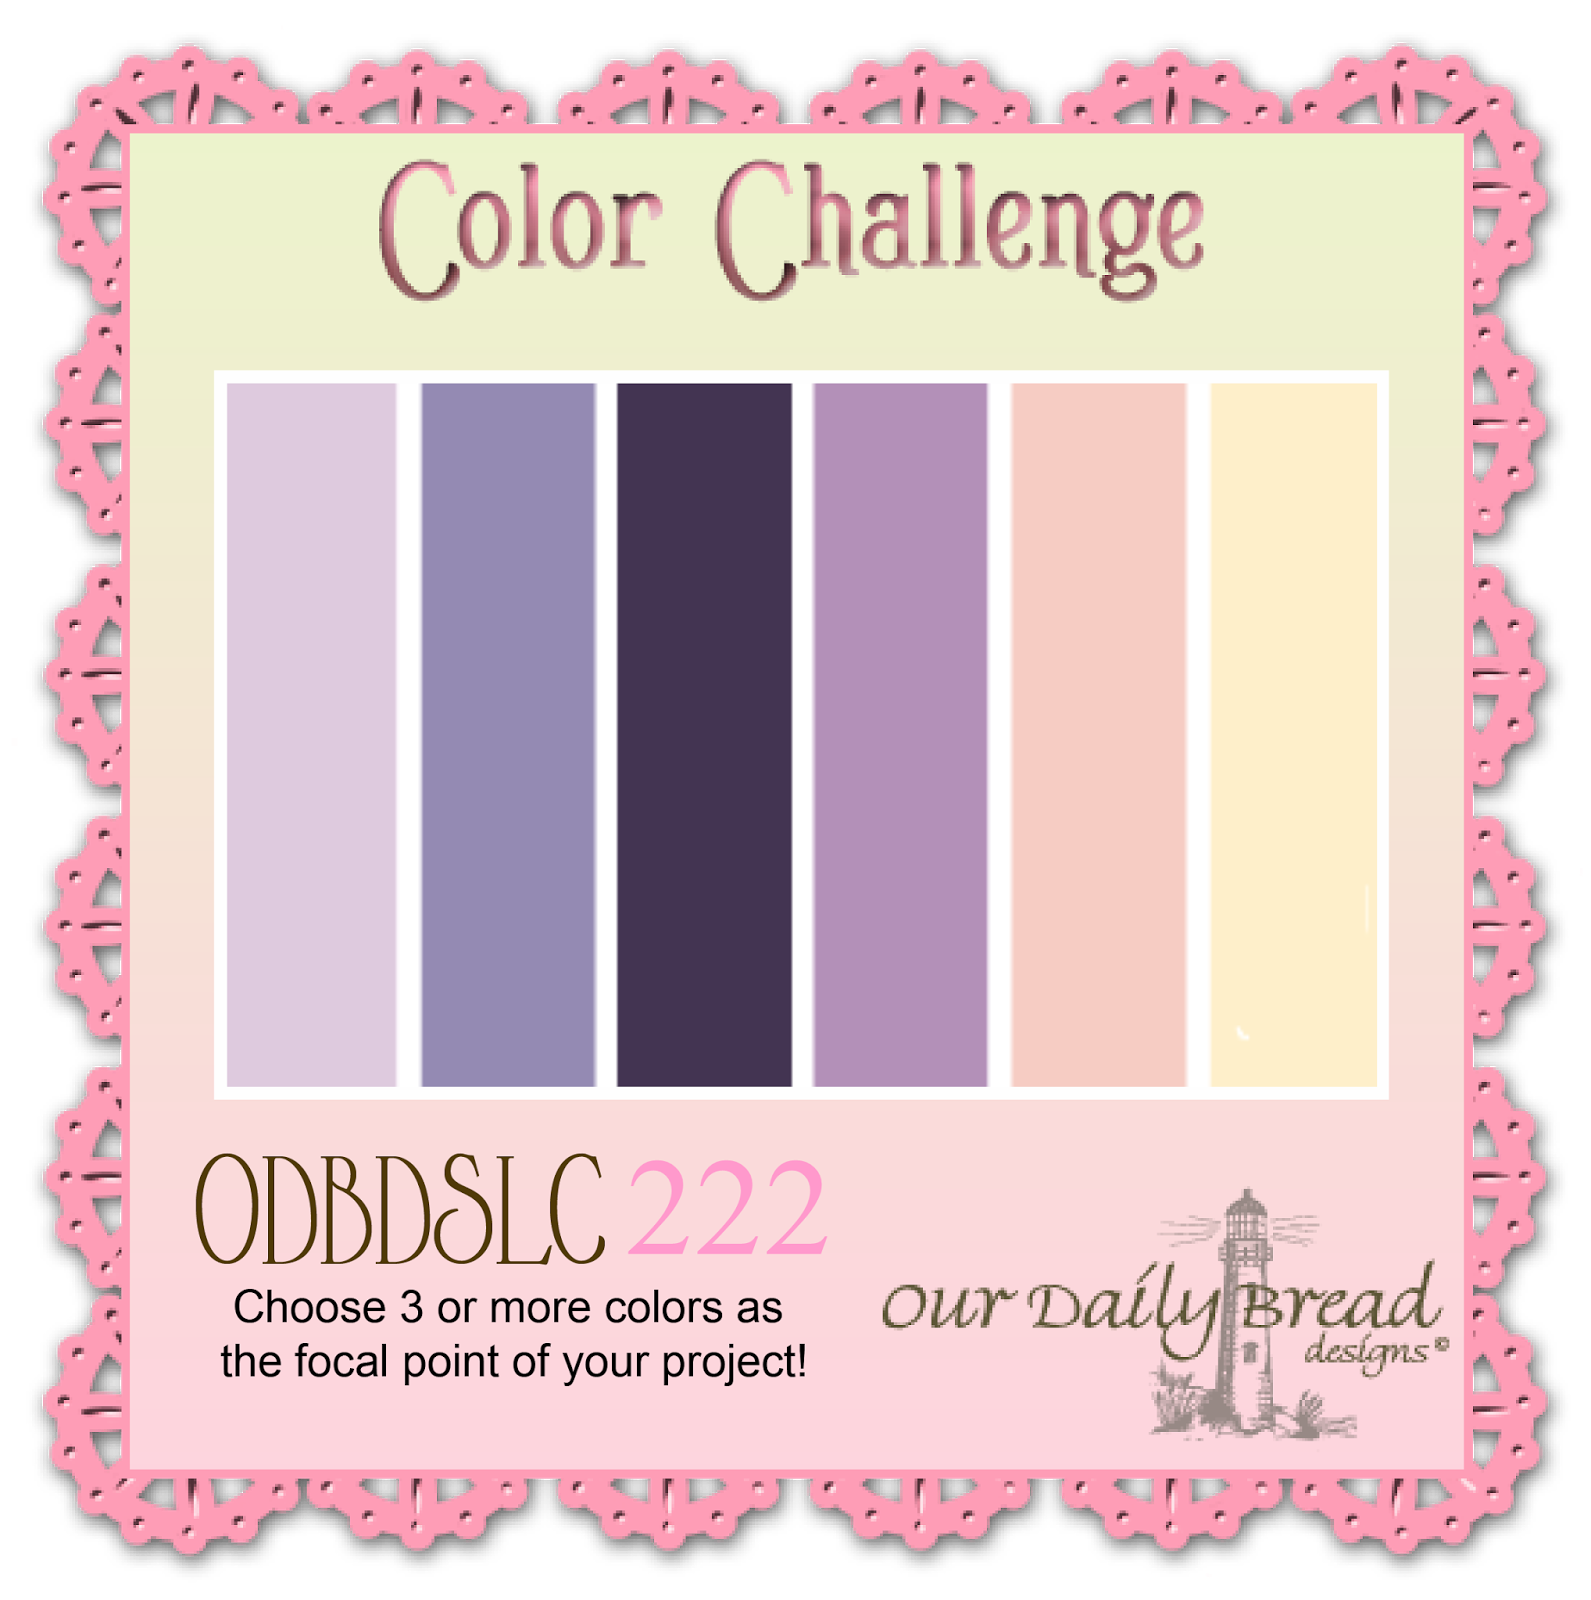 http://ourdailybreaddesignsblog.blogspot.com/2015/01/odbdslc222-color-challenge.html